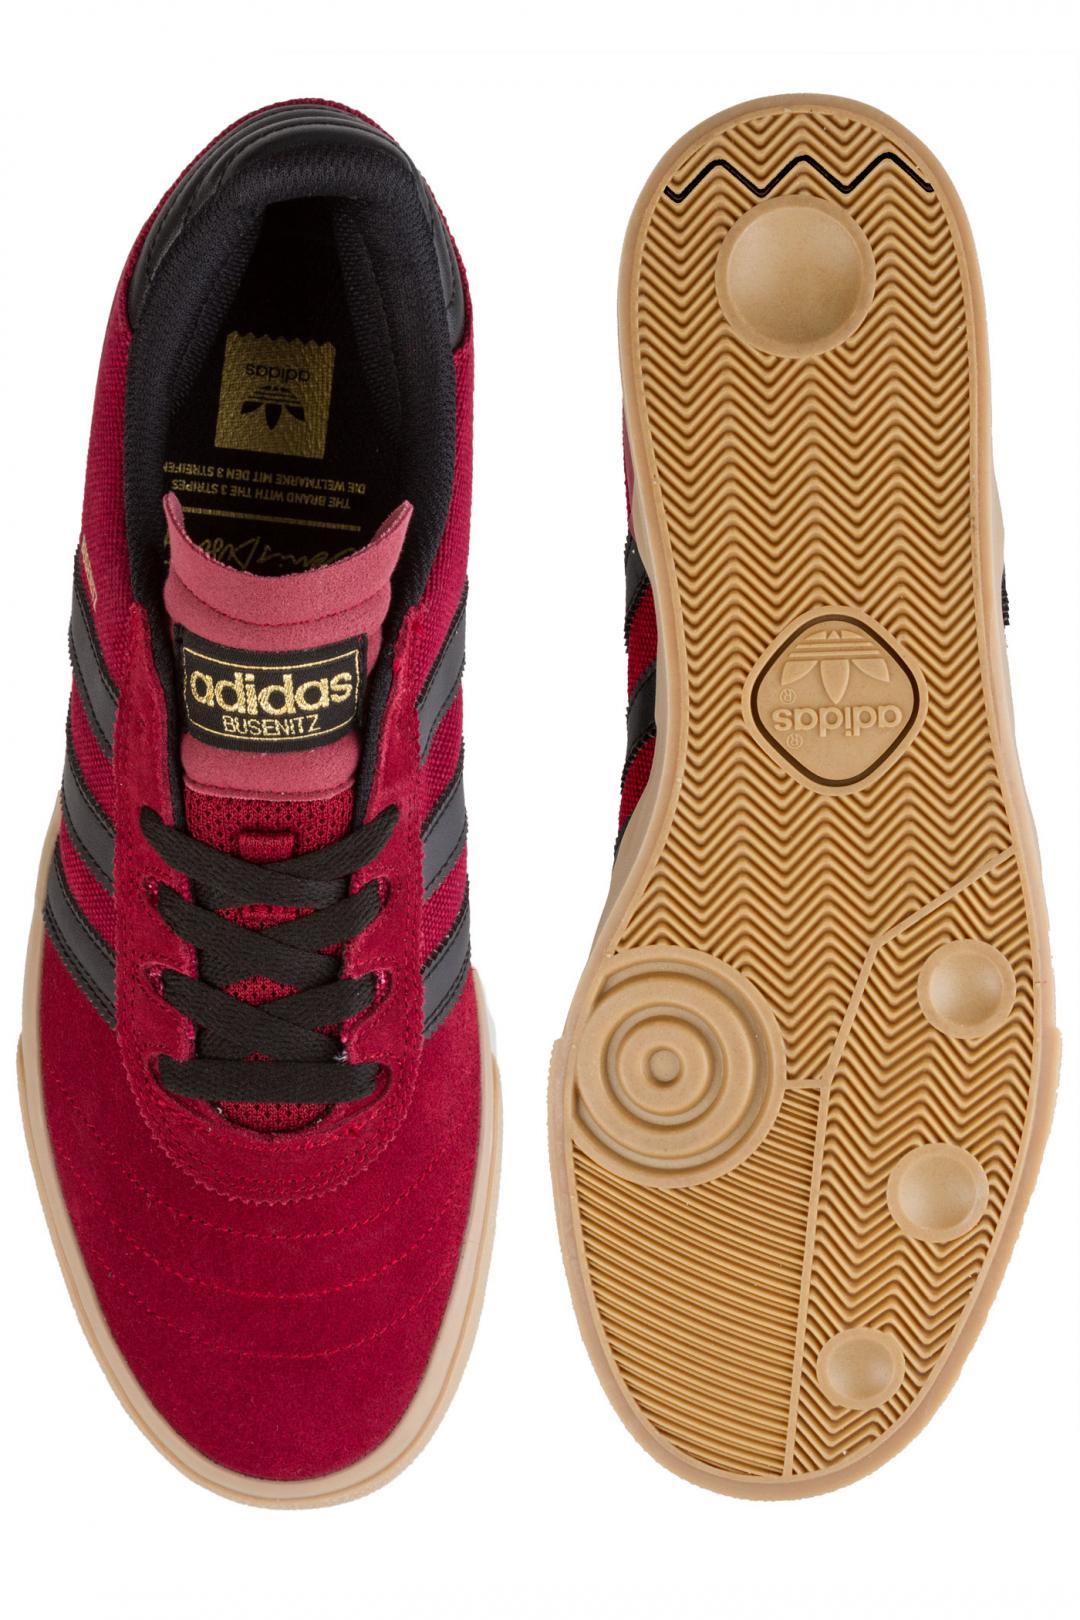 Uomo adidas Skateboarding Busenitz Vulc core burgundy black gum | Sneakers low top